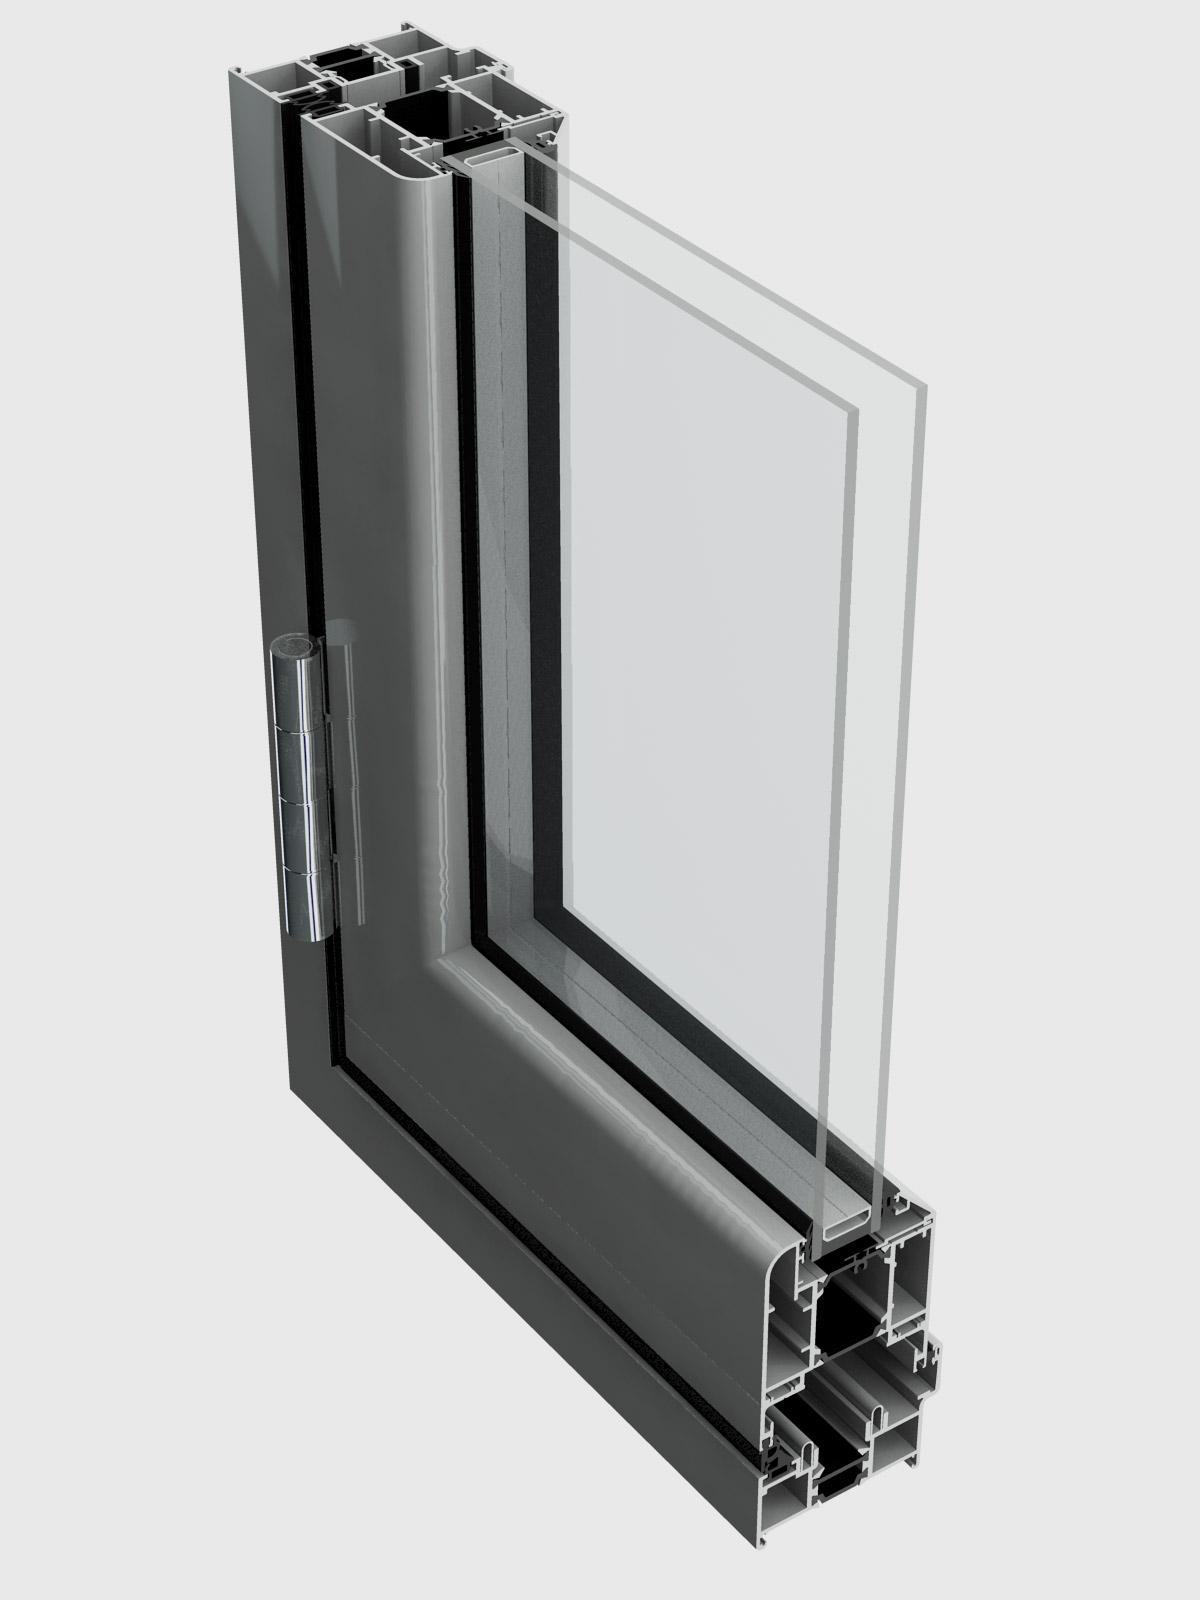 Folding Door Systems : Bsf folding door system by aluk gb ltd